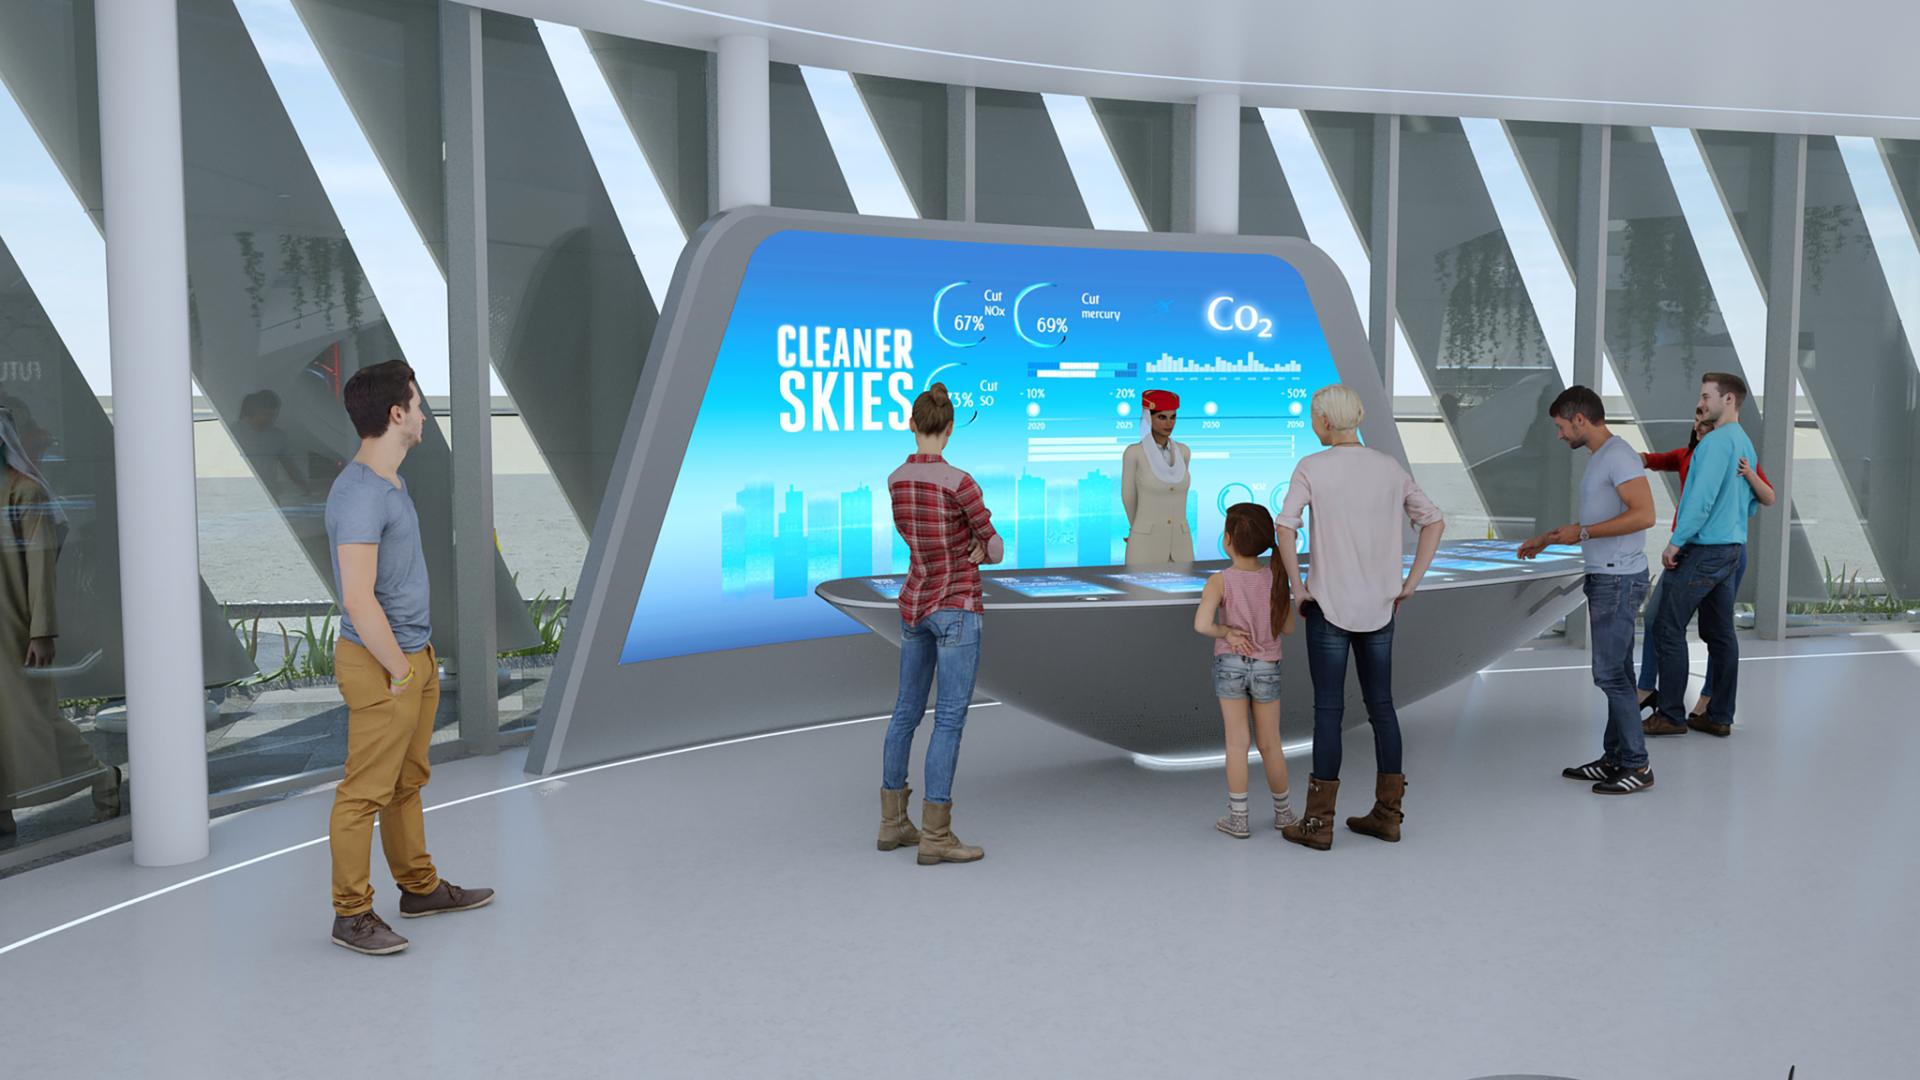 Emirates offers a sneak peek inside its Expo 2020 pavilion